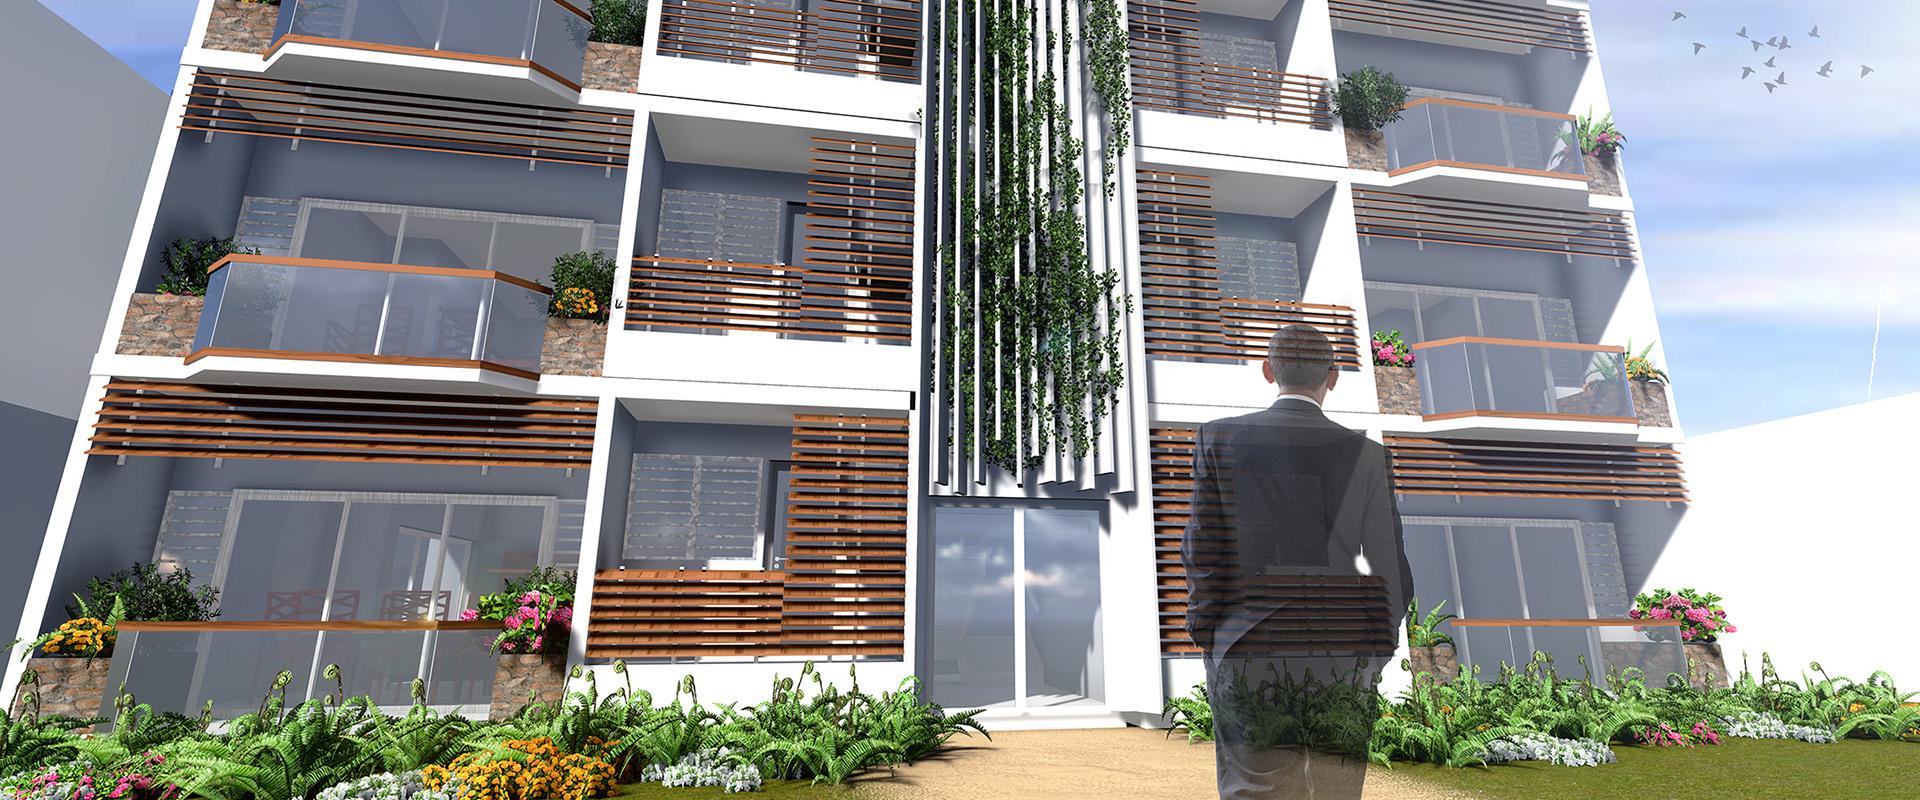 ImmEPNA -1_barla_architectes_Douala_cameroun